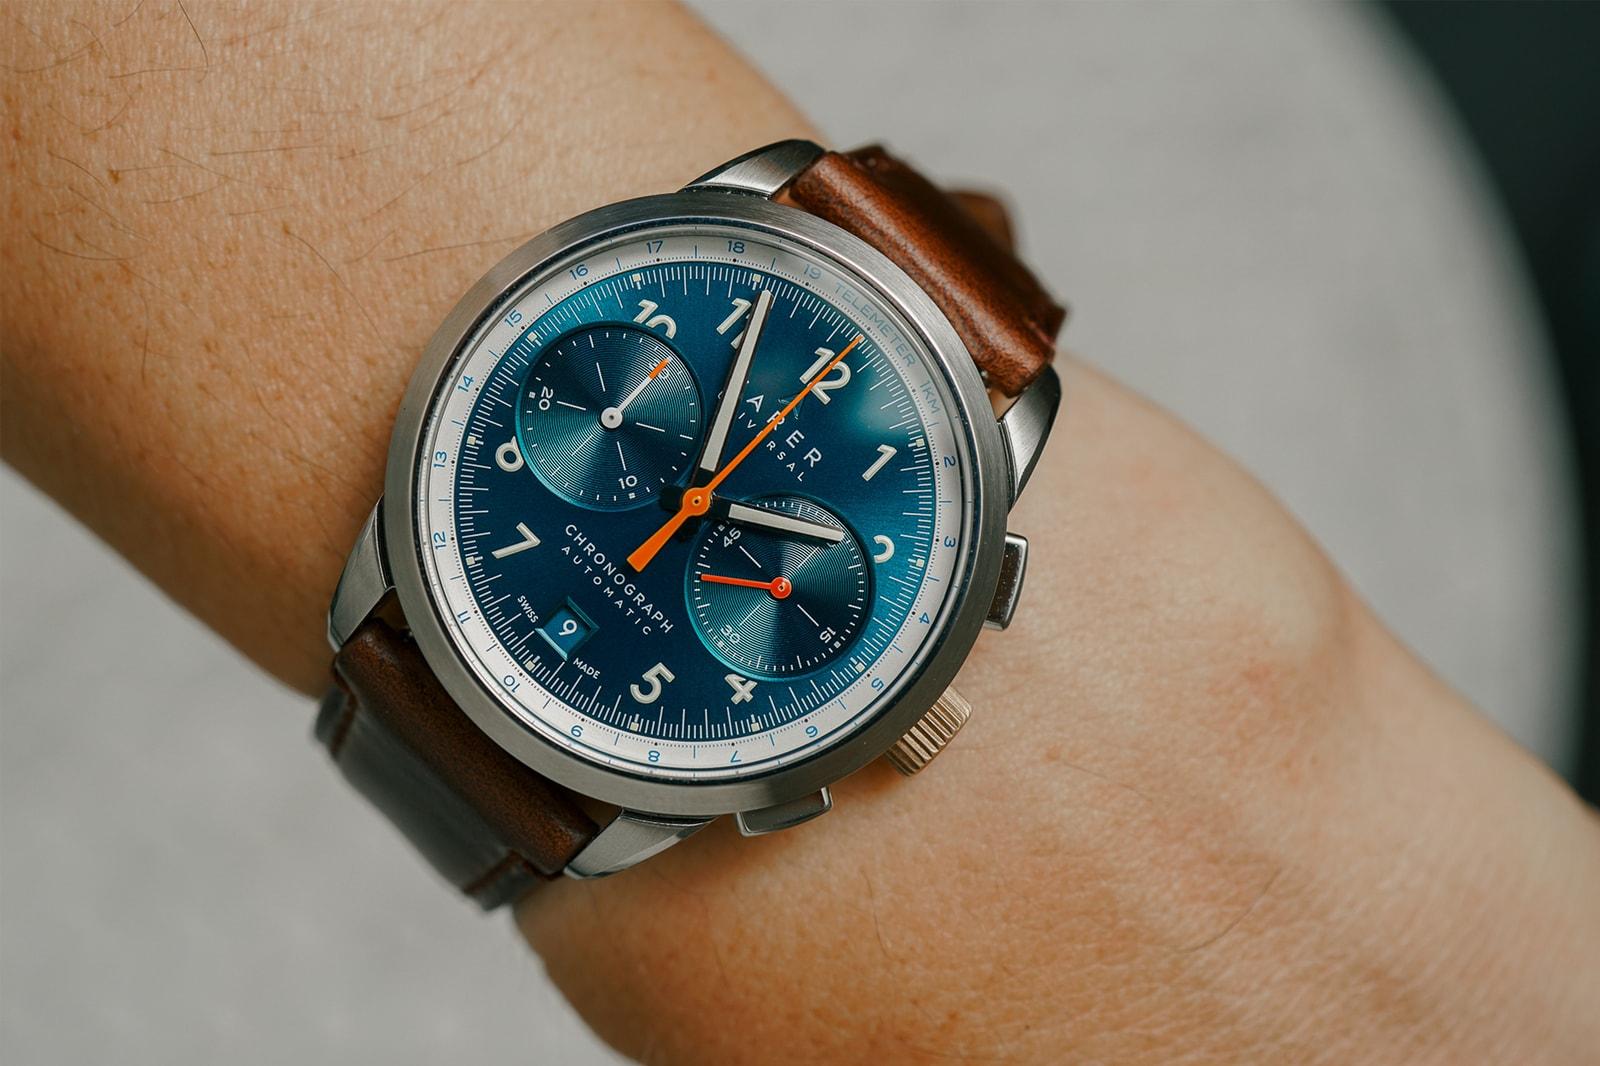 Eight Independent Watch Brands From Windup Watch Fair Monta Oris Halios Autodromo watches wrist watch clocks timekeeping style micro brands